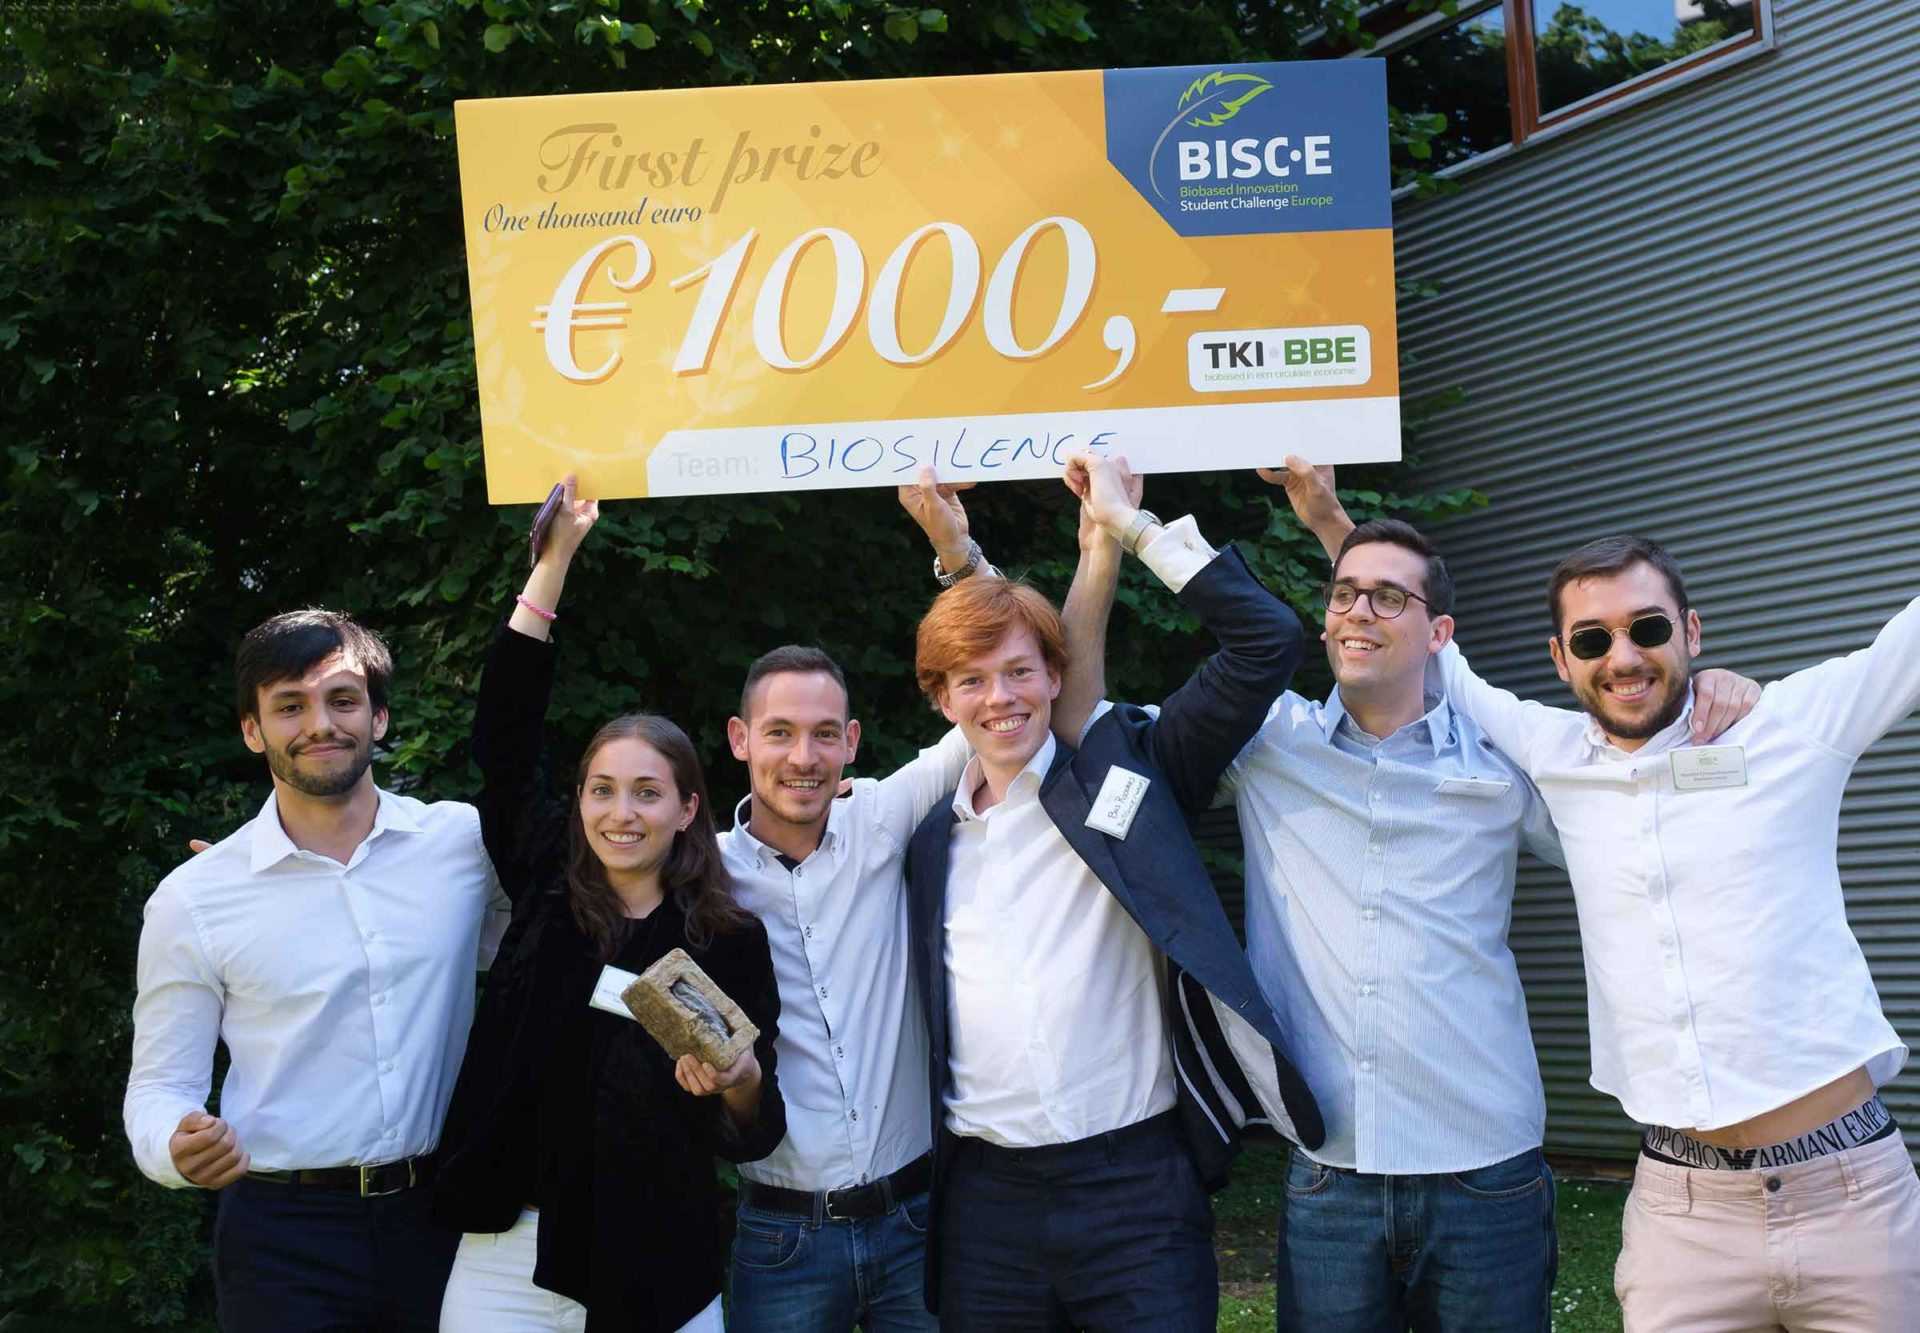 Team Biosilence wint studentencompetitie BISC-E